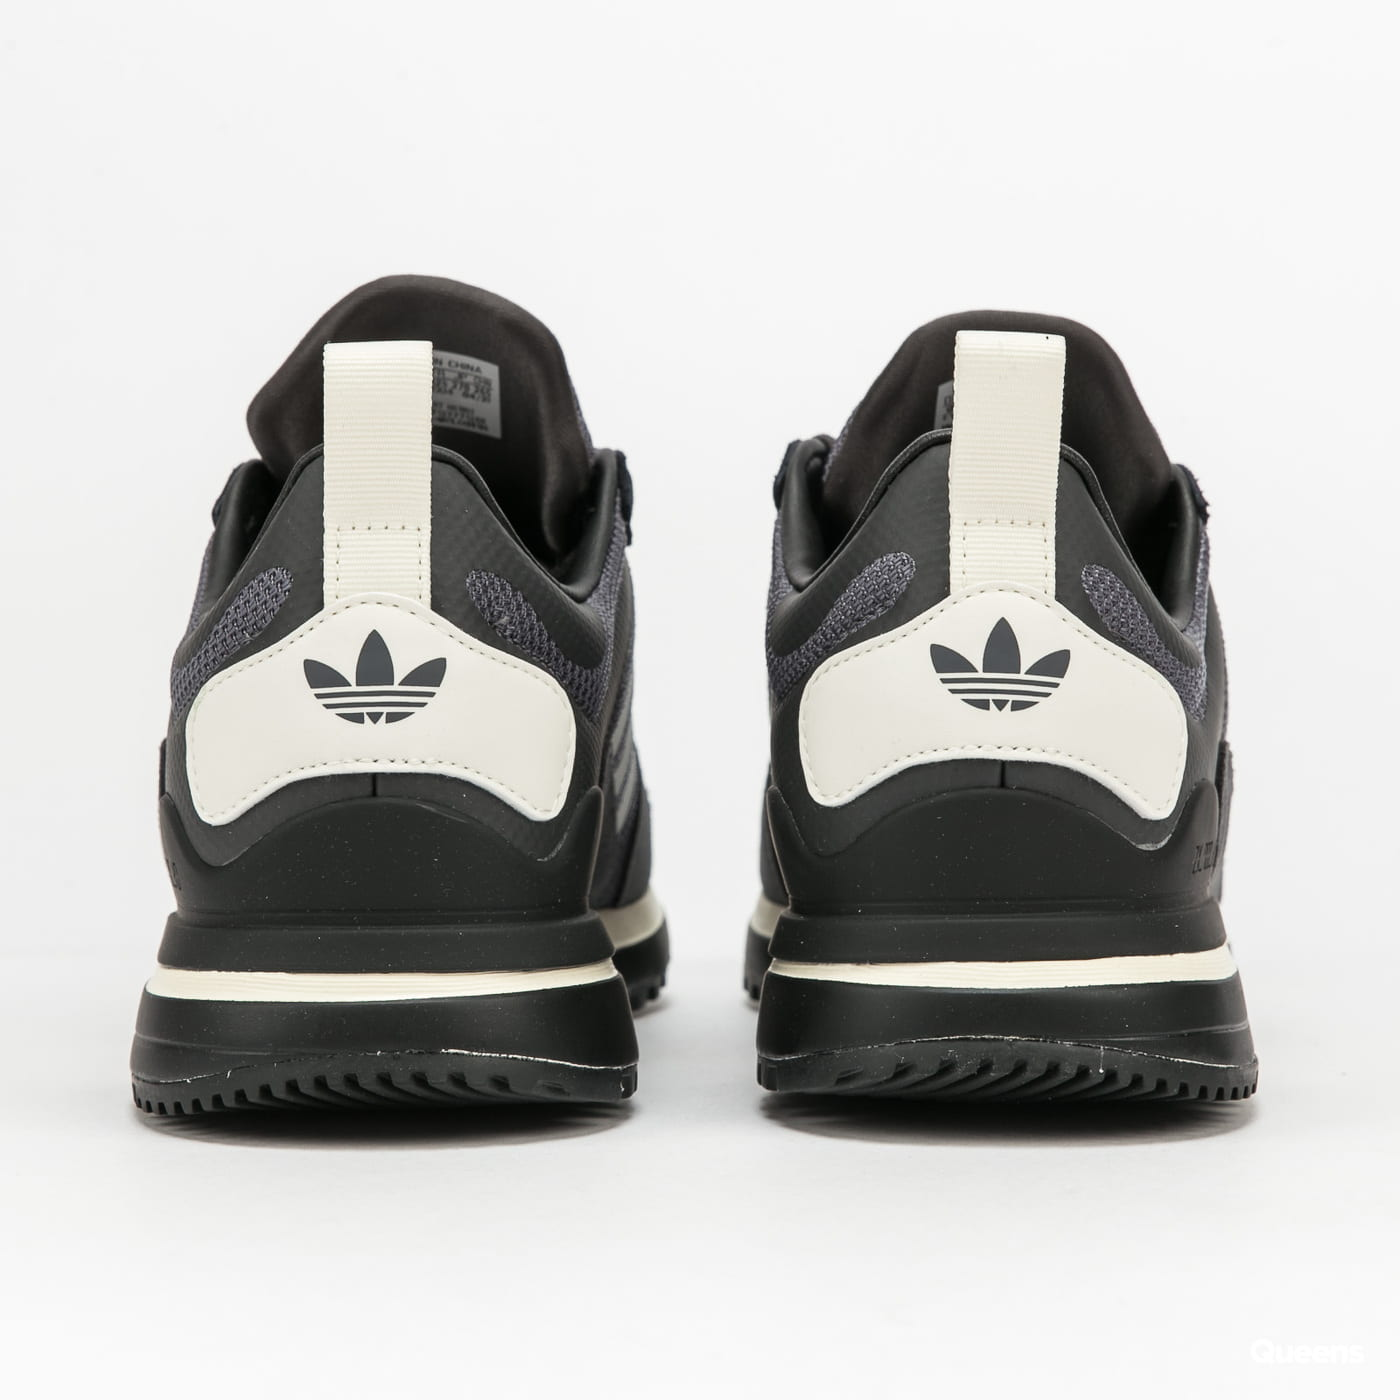 adidas Originals ZX 700 HD gresix / owhite / grefou